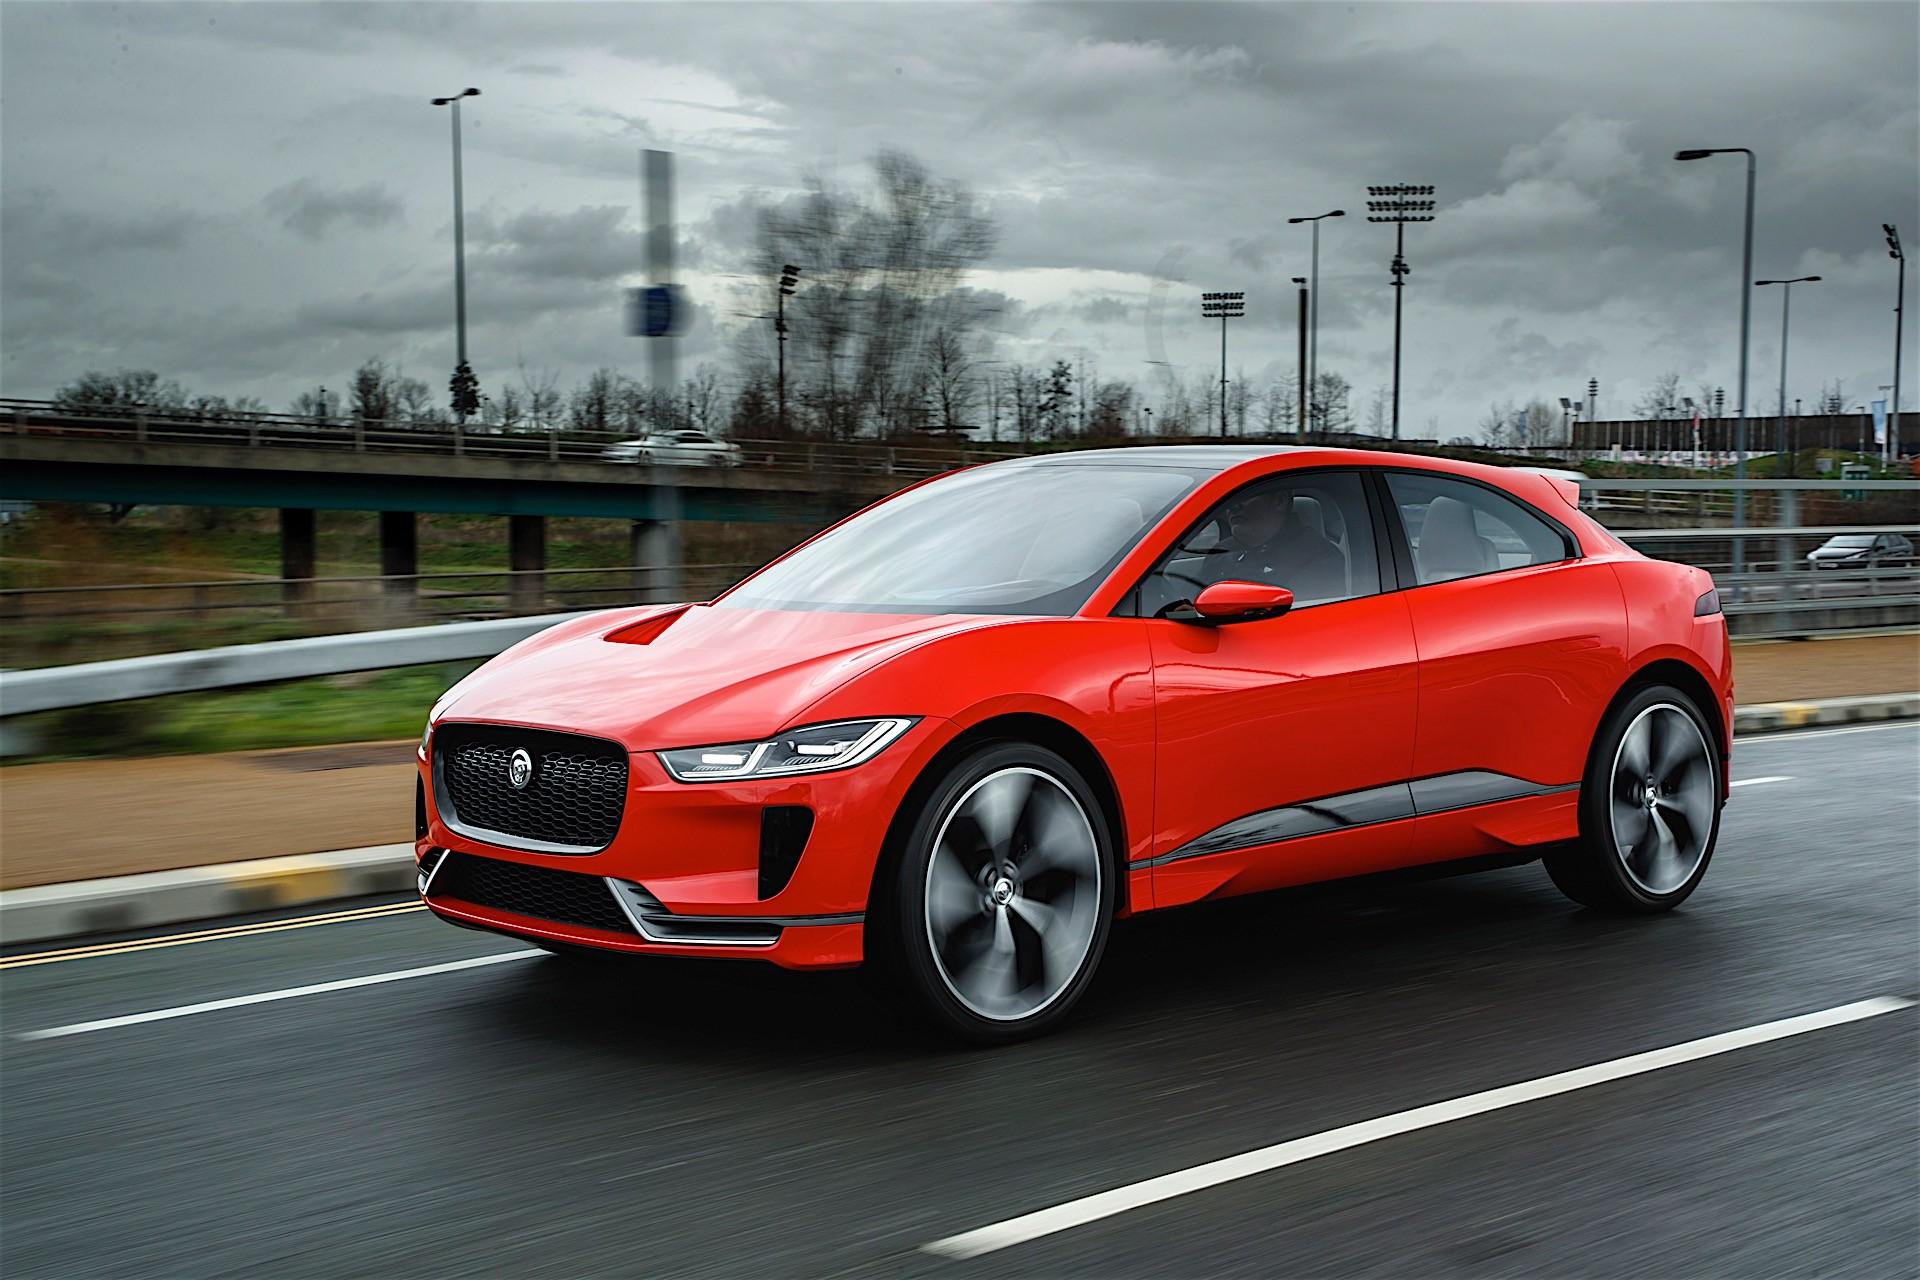 Jaguar Electric SUV To Debut At 2017 Frankfurt Motor Show ...